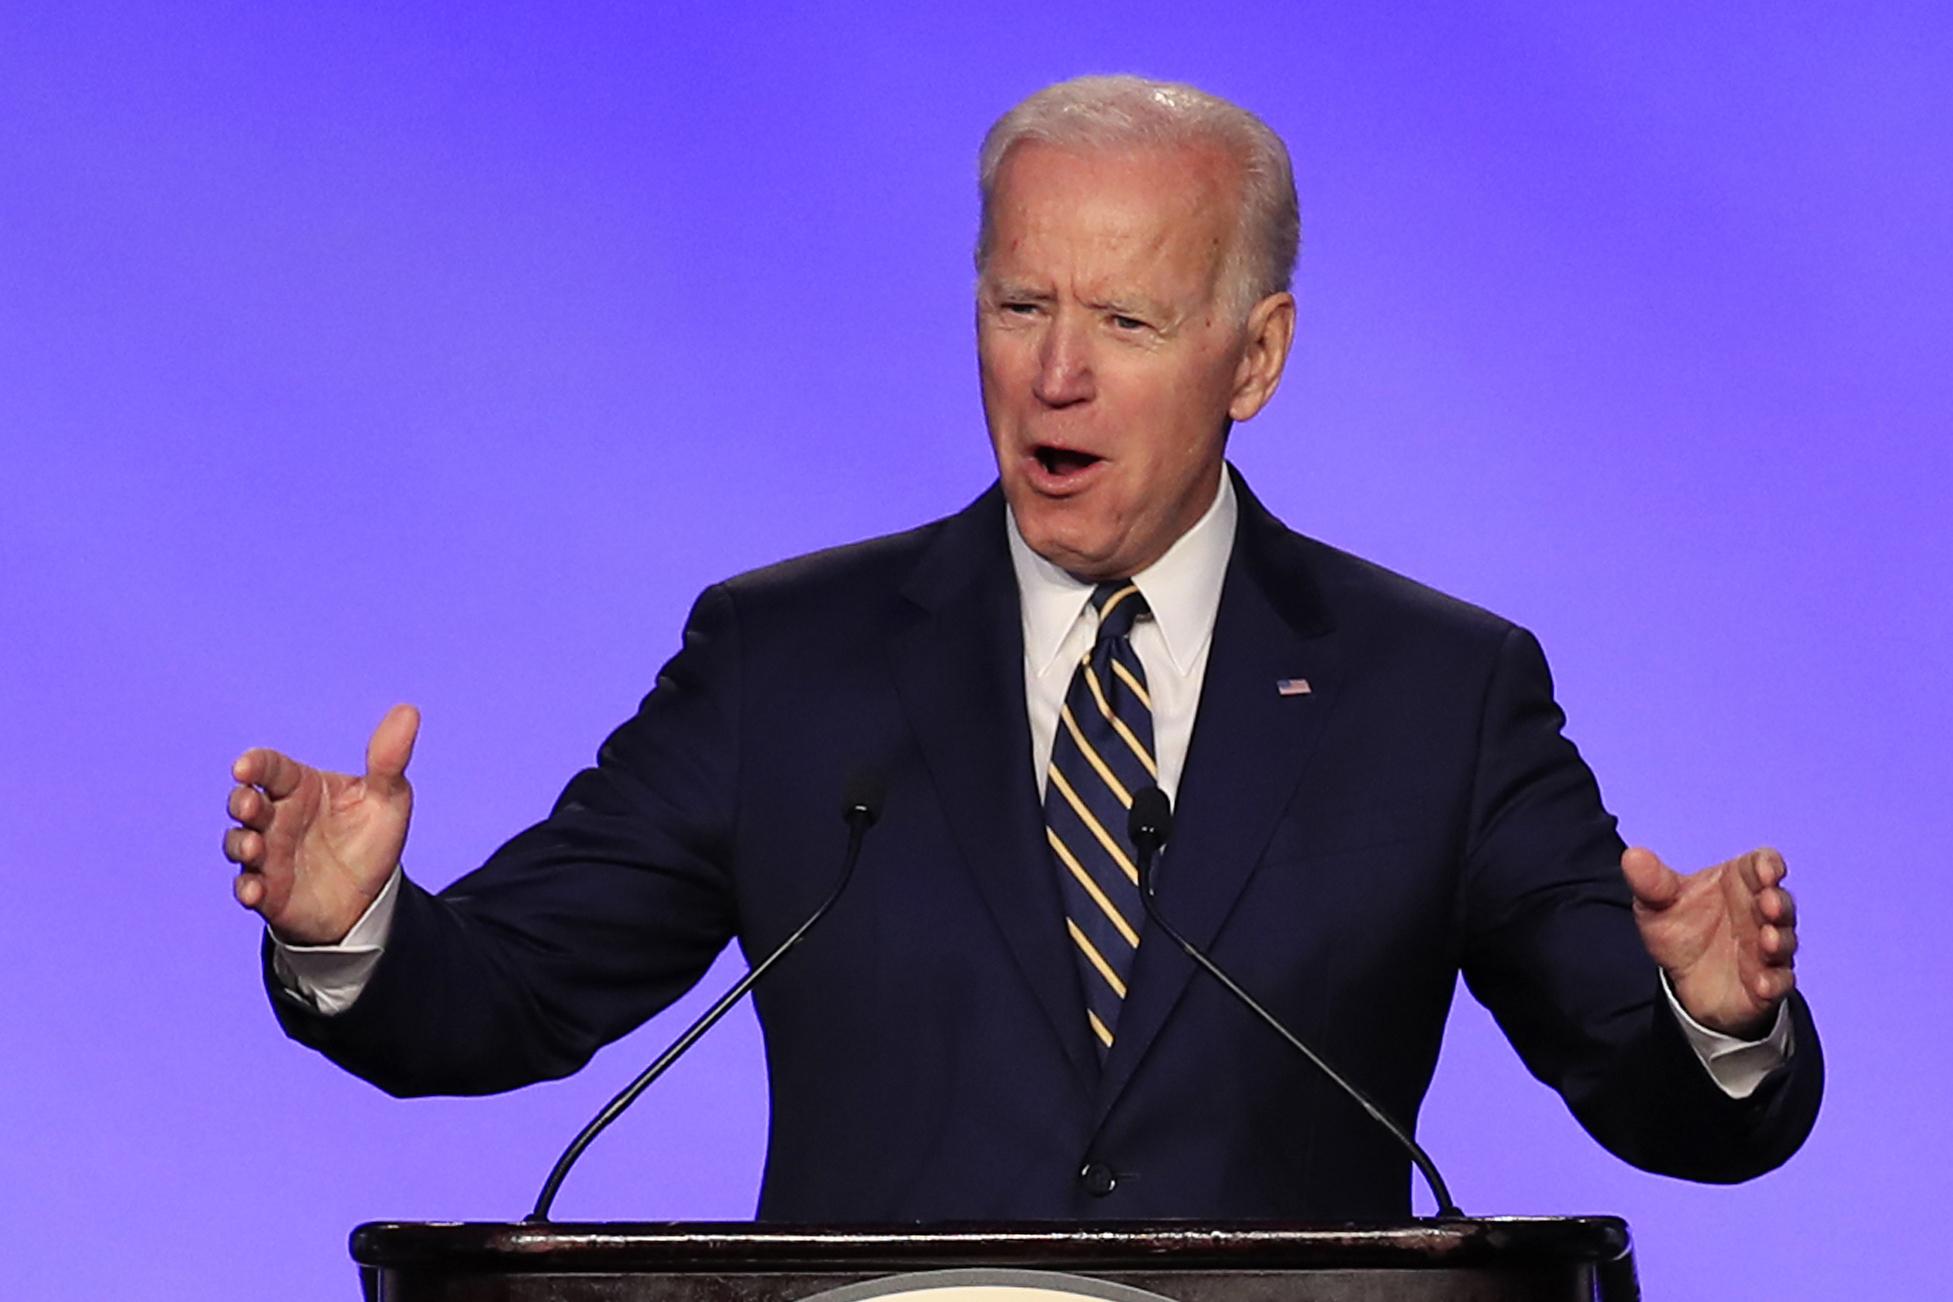 Election_2020_Joe_Biden_42107-159532.jpg26836688